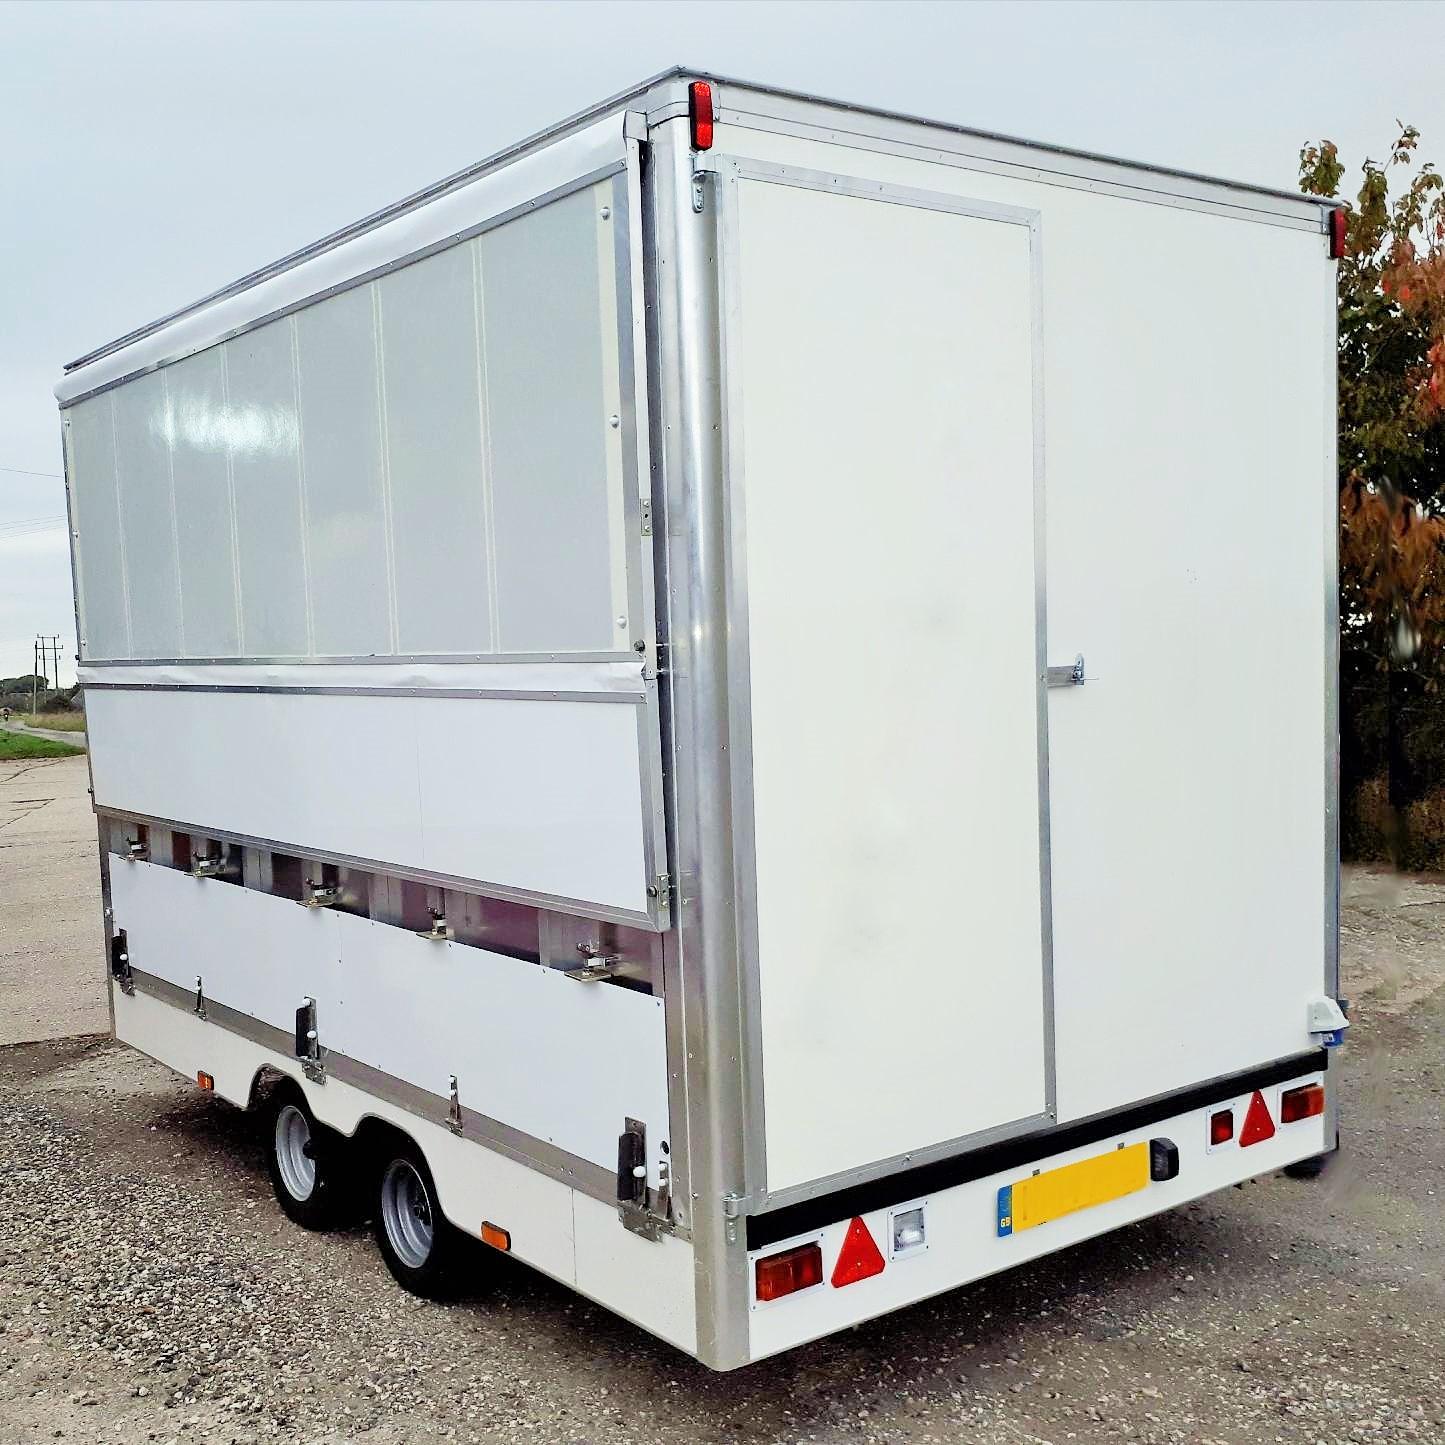 mobile exhibition unit | catering trailer |retro vintage catering